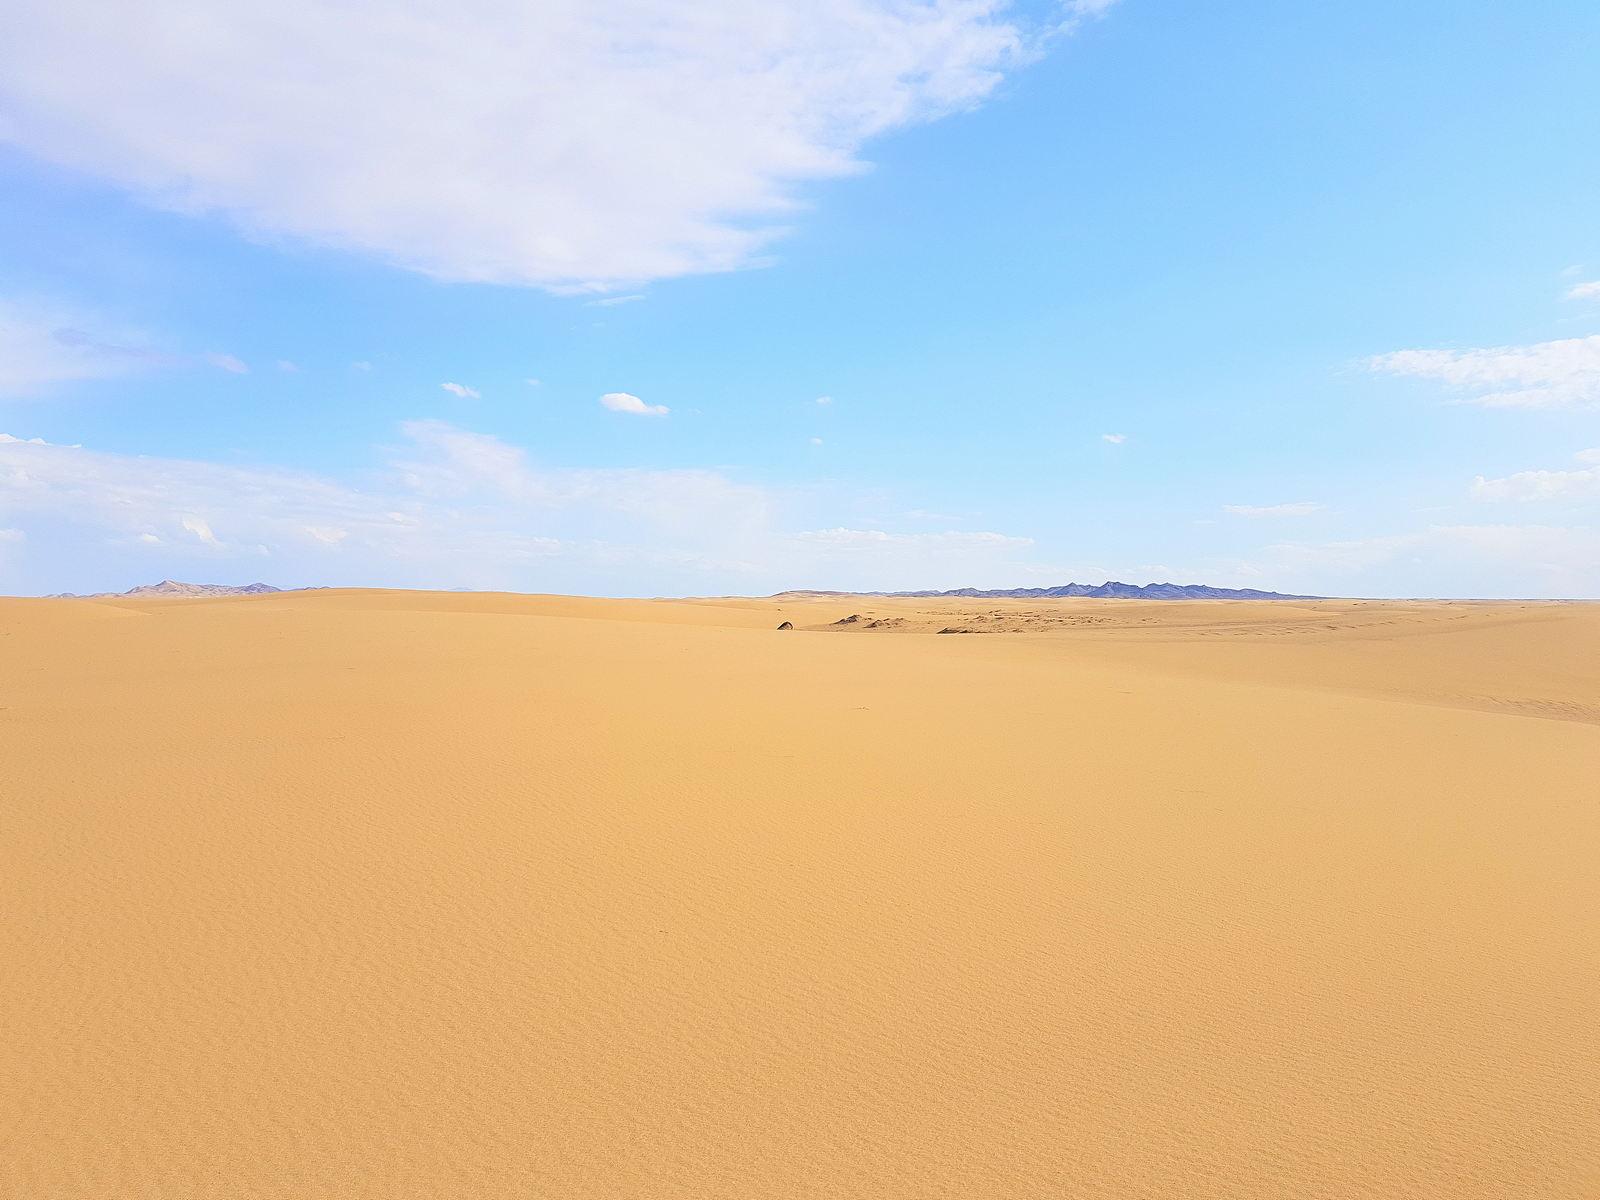 5-Day Iran Desert Tour Express